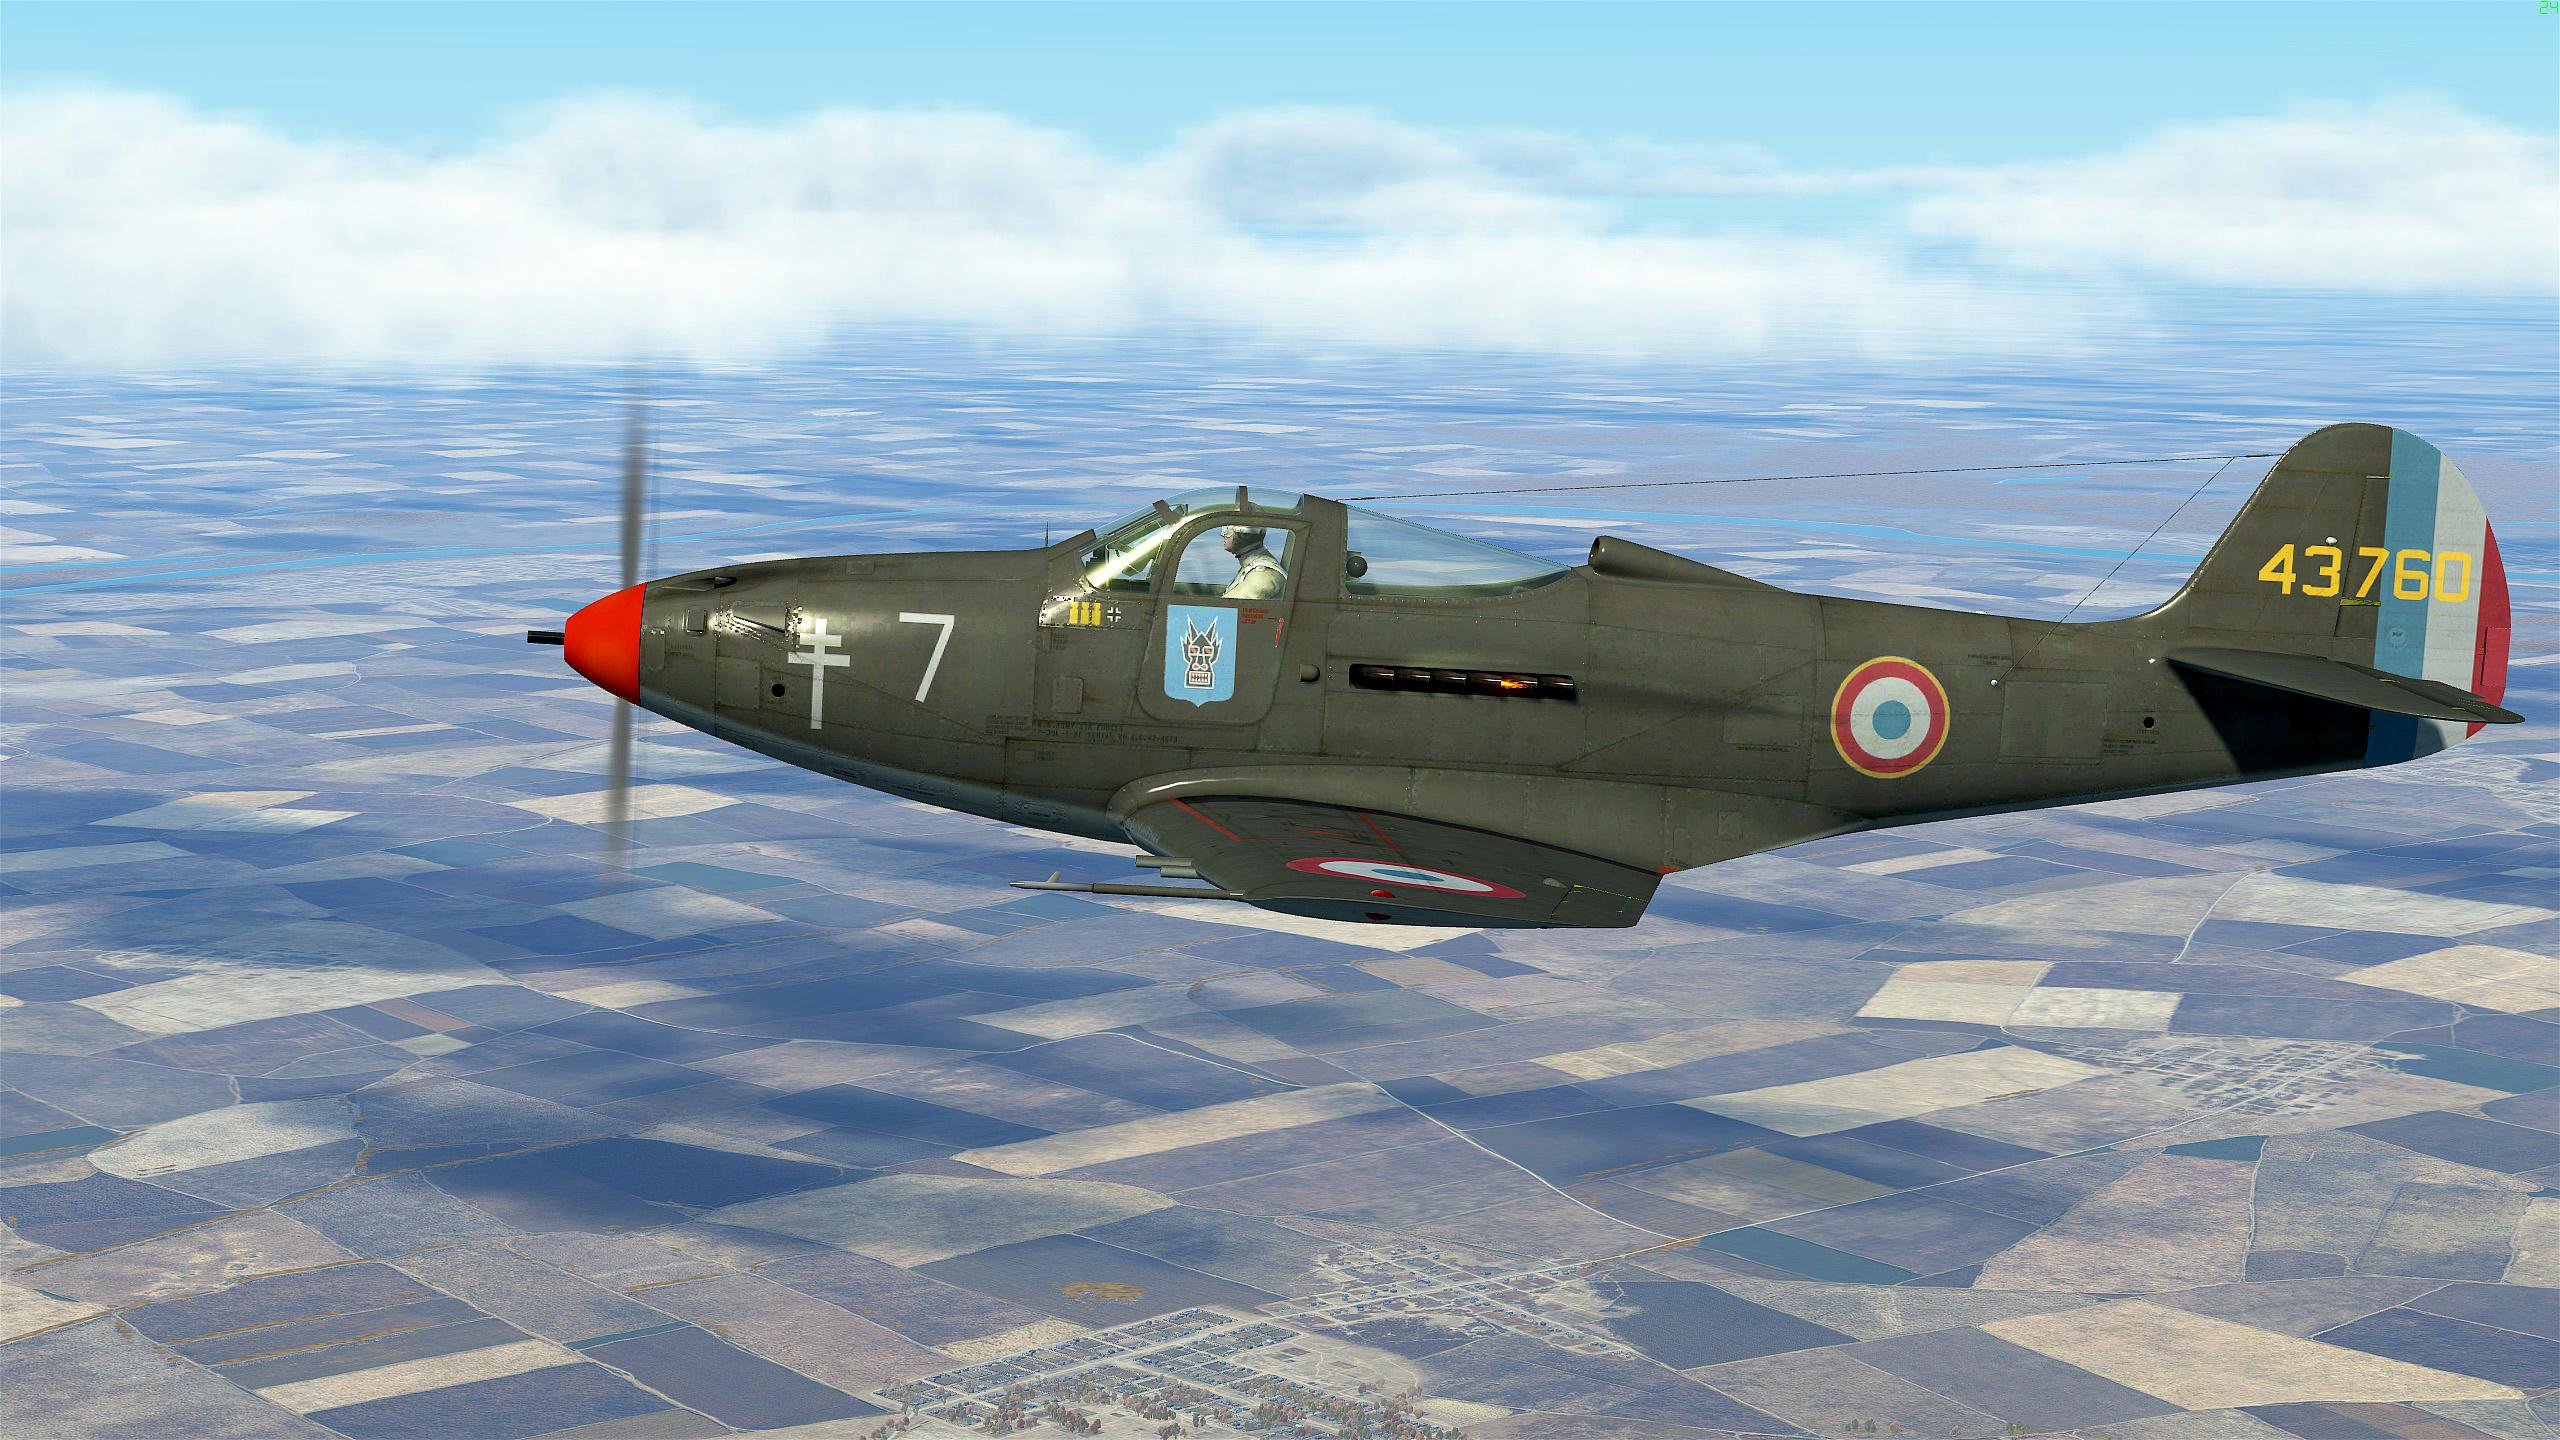 PACK P-39 FRANCAIS Kiqi0zhpo4gay5azg